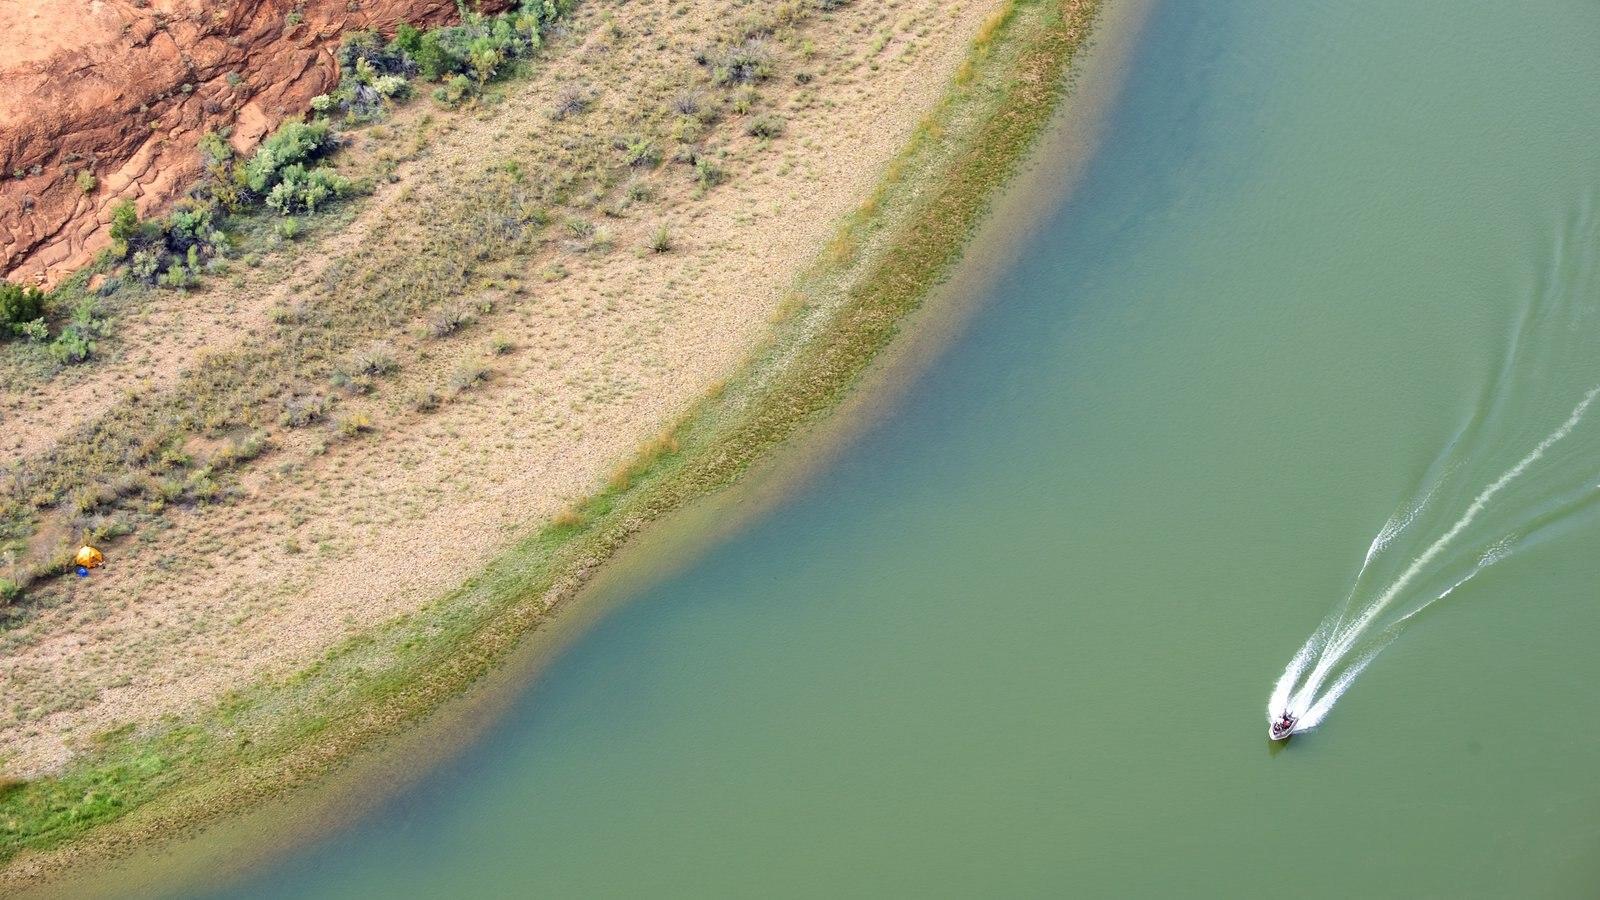 Horseshoe Bend caracterizando um lago ou charco e canoagem